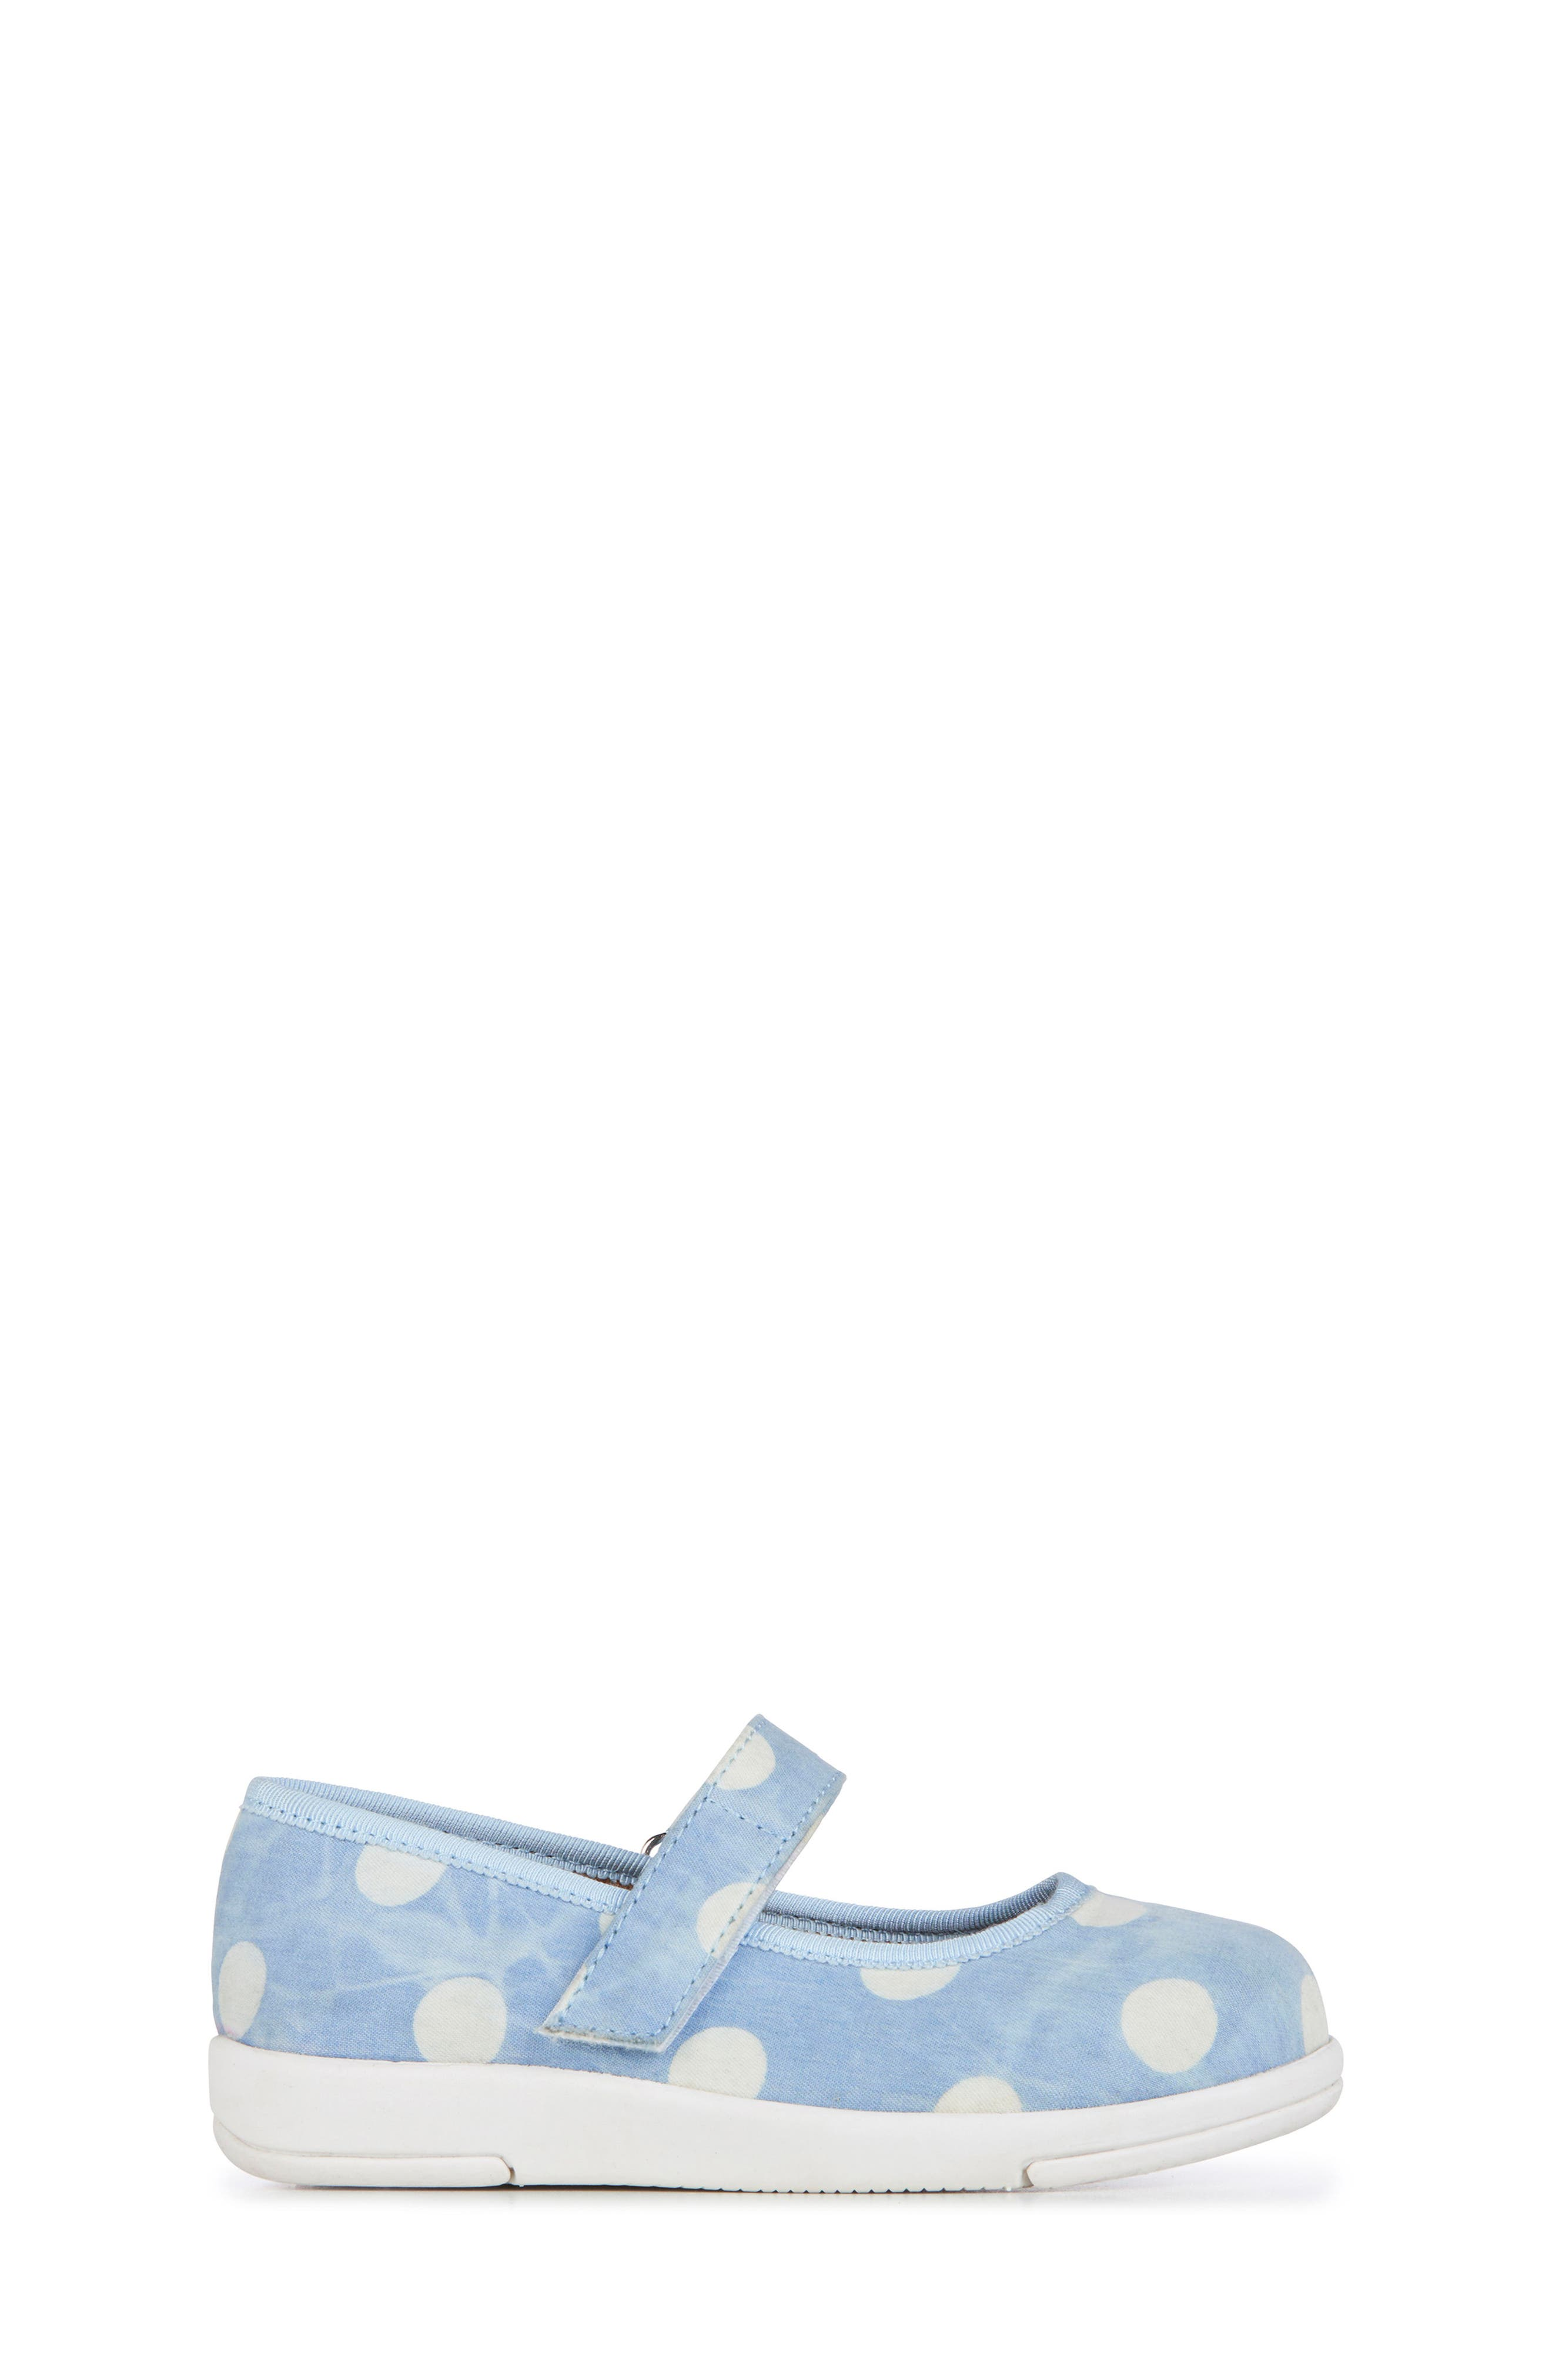 Deena Mary Jane Sneaker,                             Alternate thumbnail 3, color,                             SPOT LIGHT DENIM DISTRESS